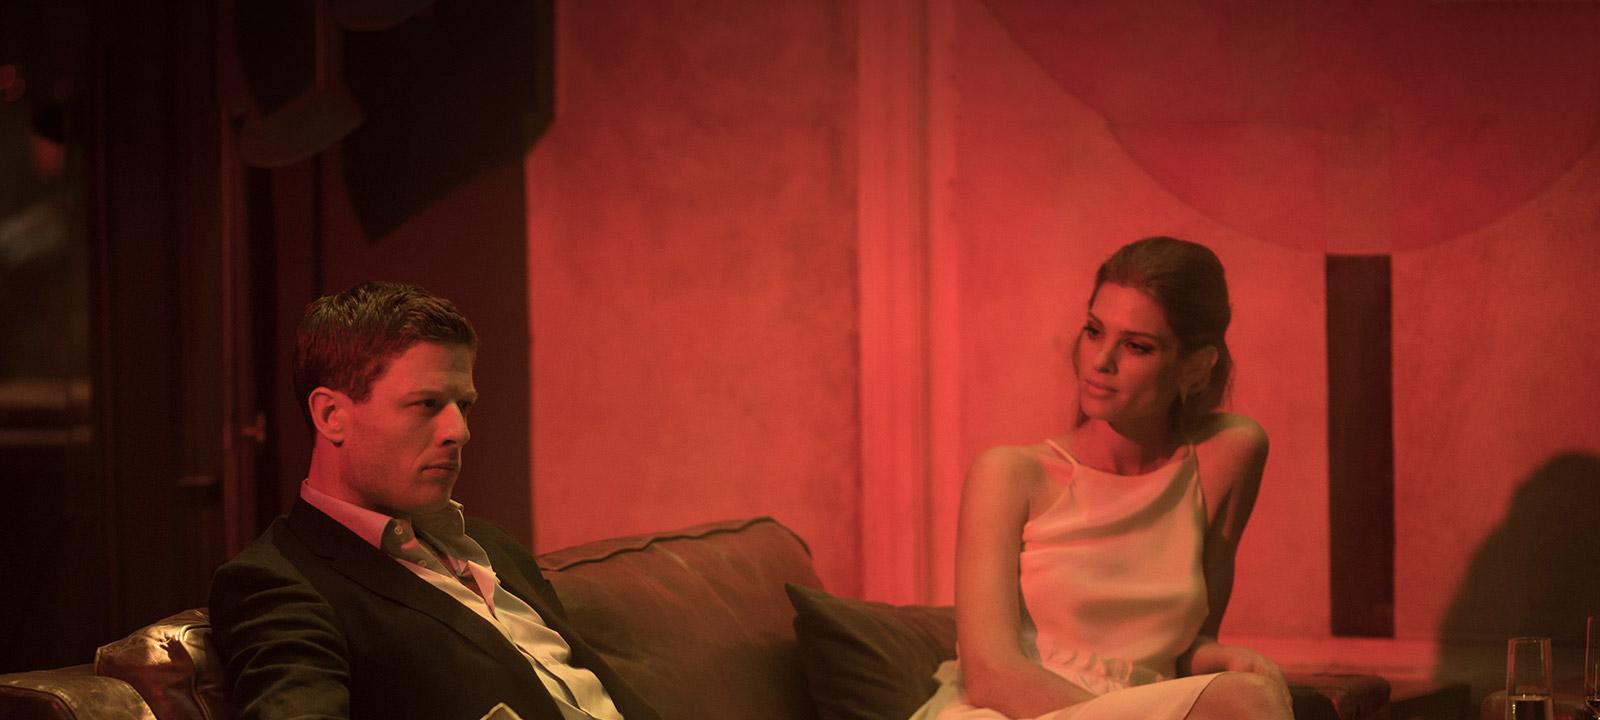 McMafia Season 1, Episode and Cast Information - AMC